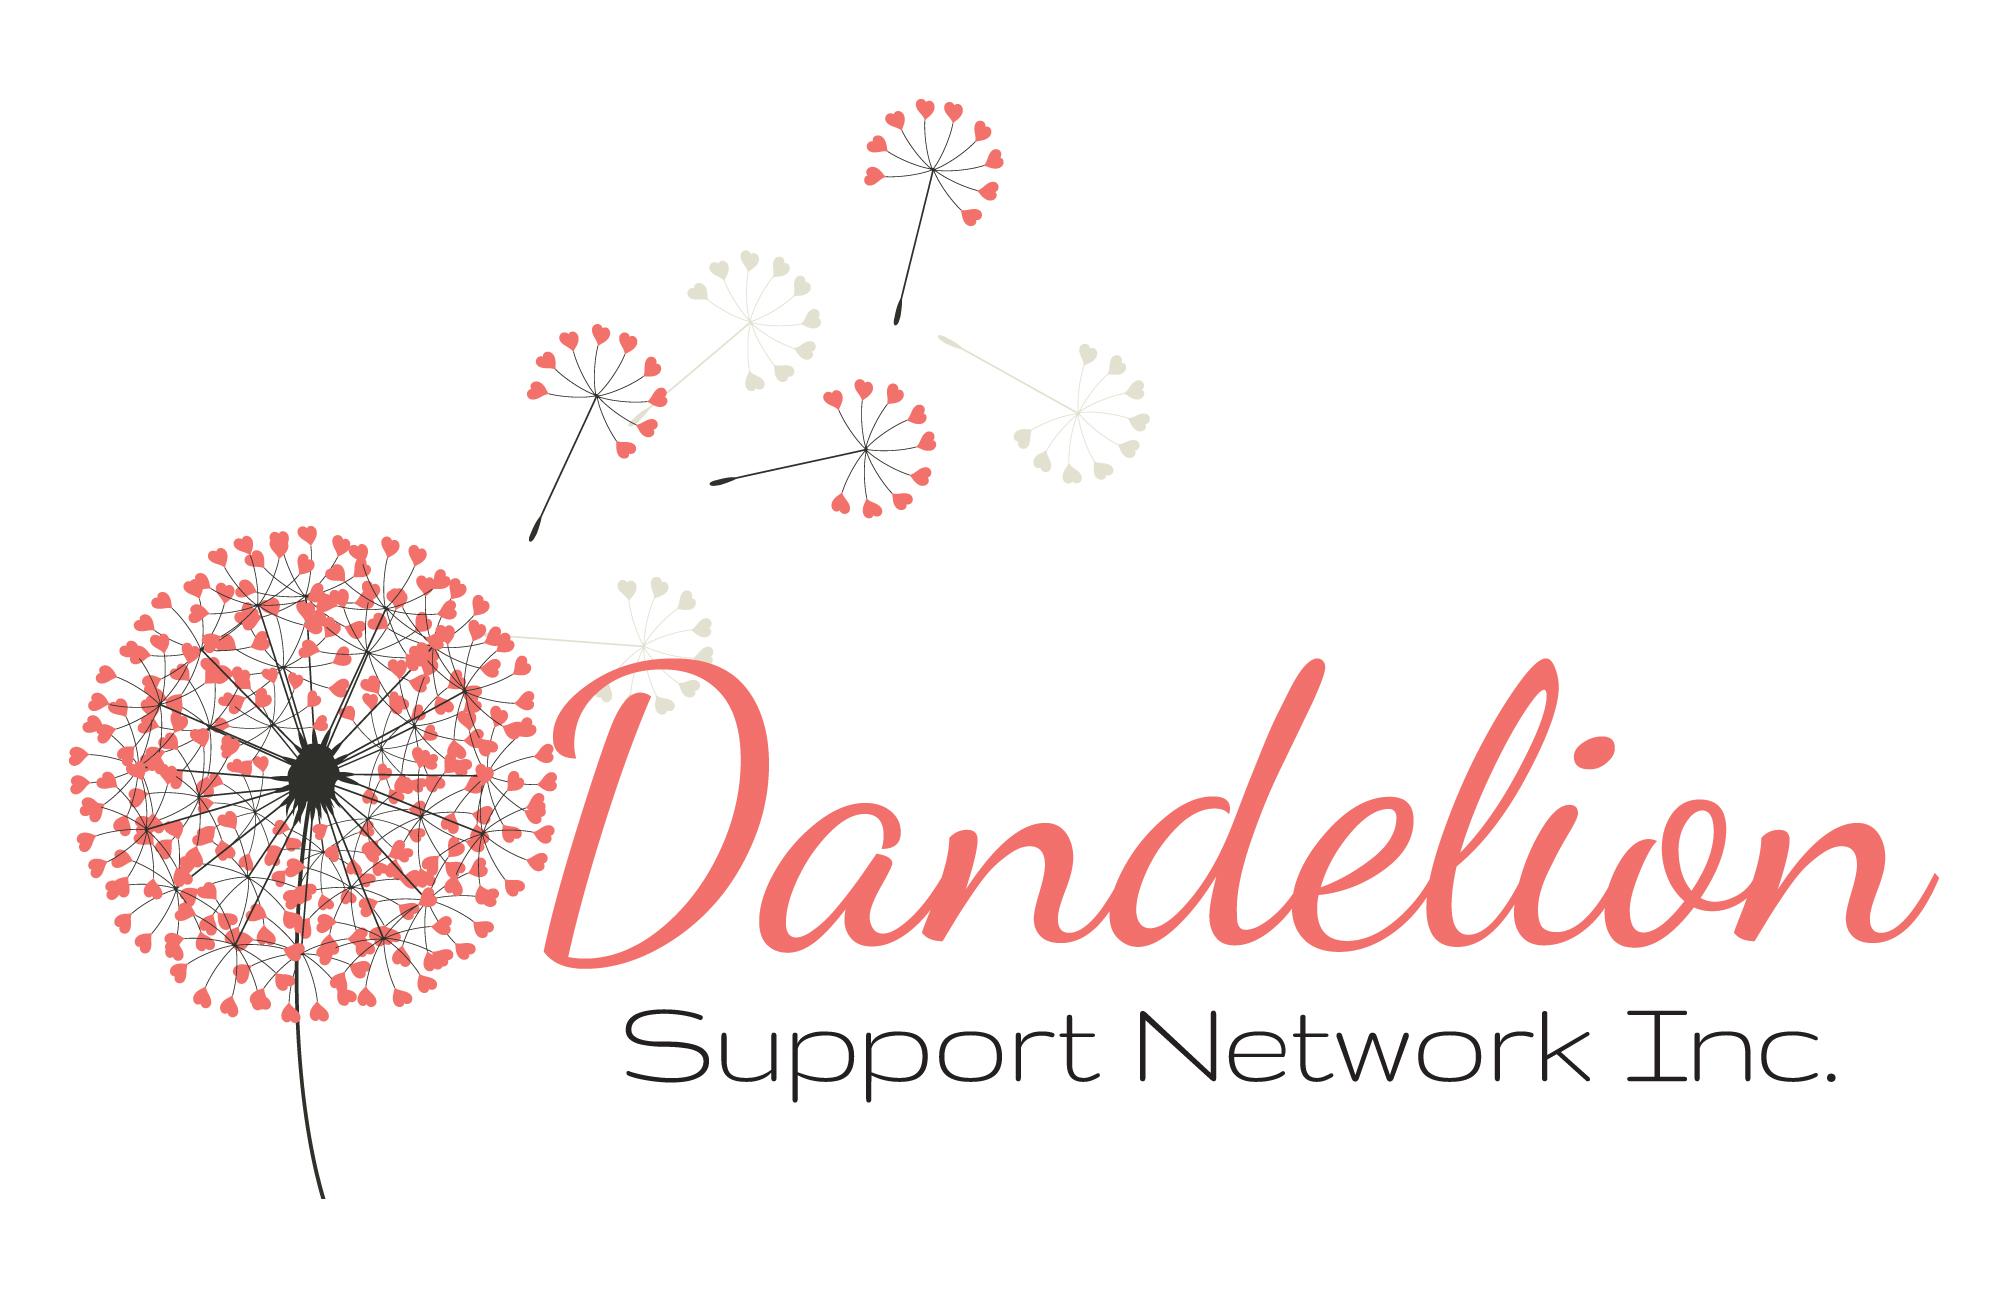 Dandelion Support Network